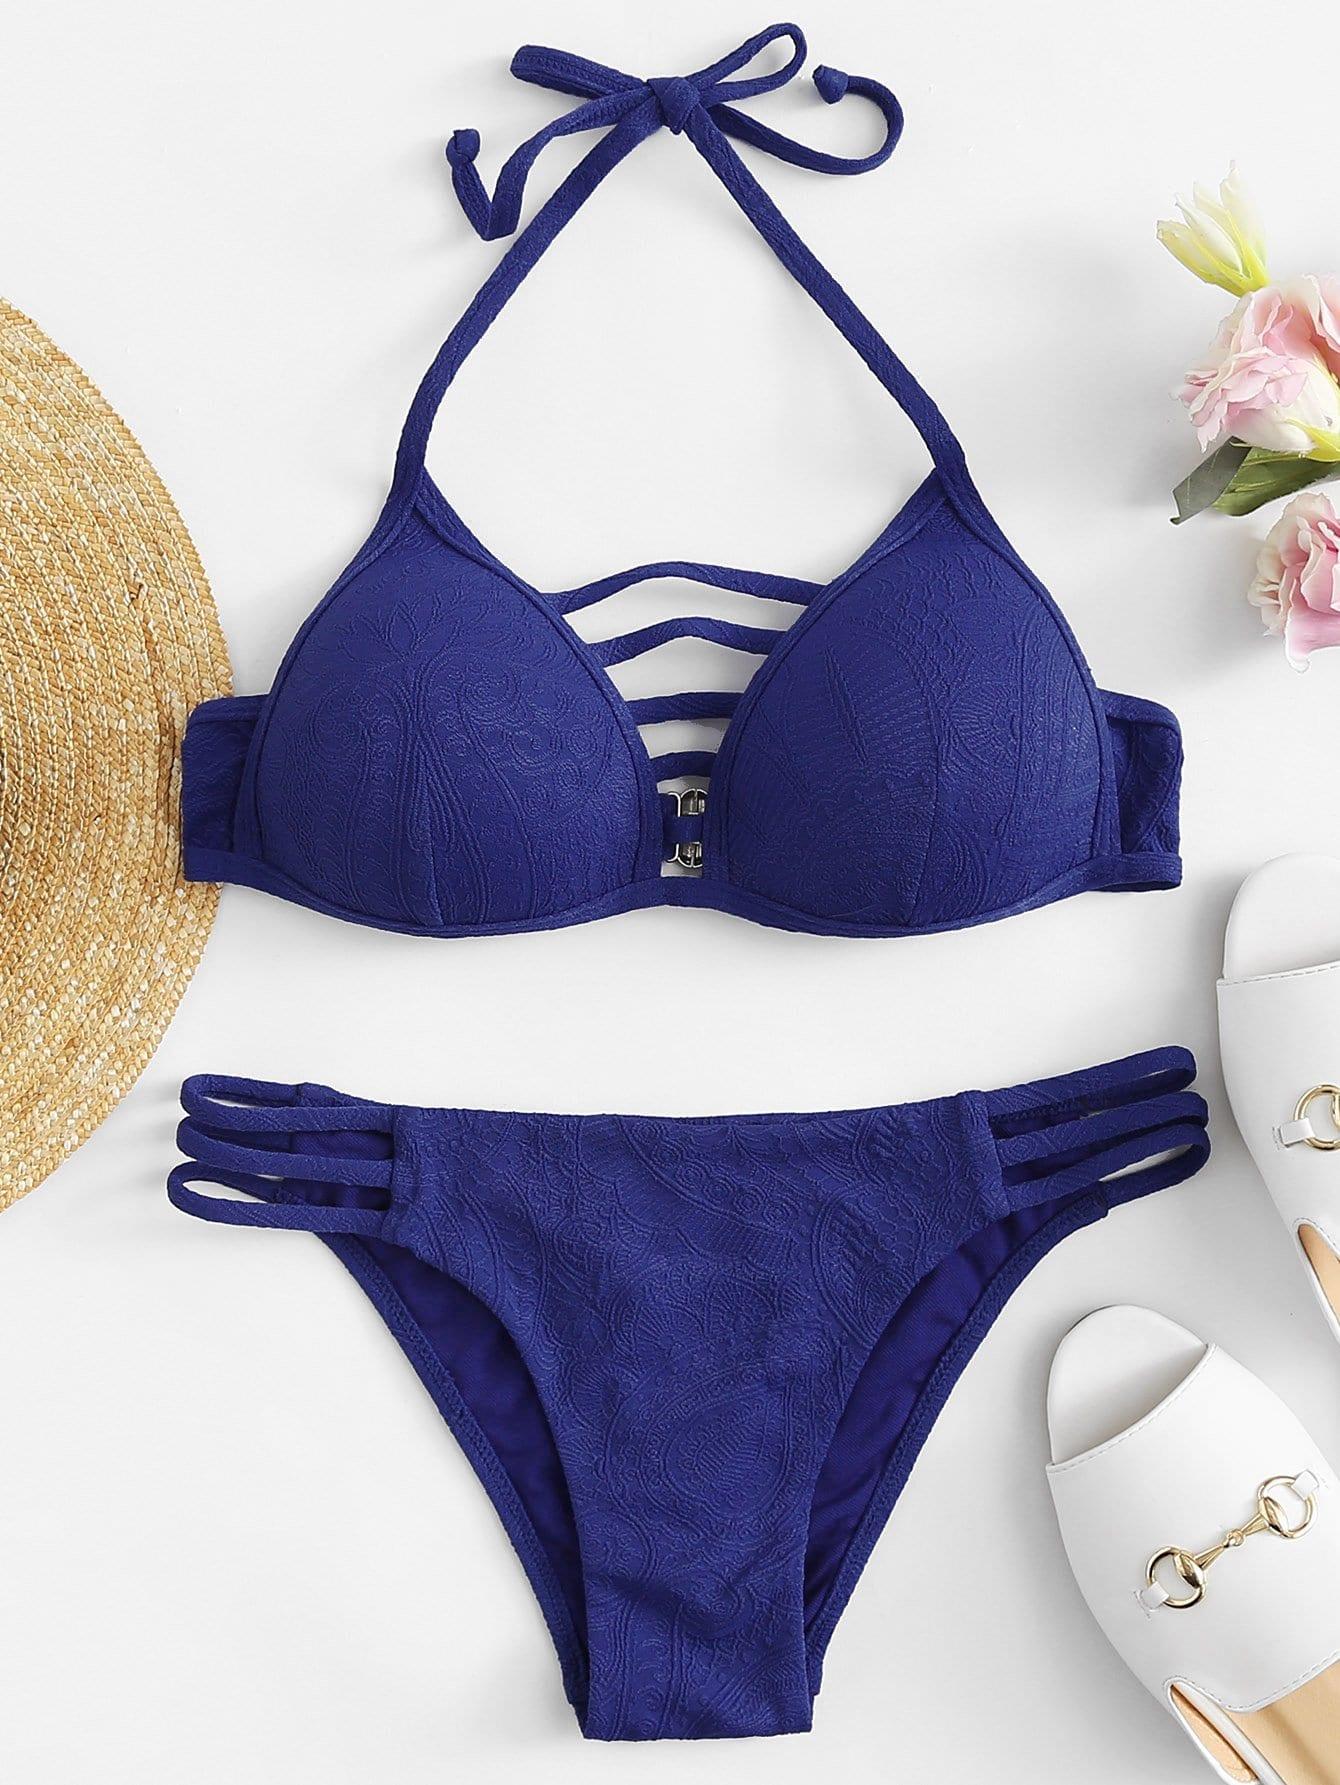 Halter Neck Strappy Bikini Set ripped halter neck strappy bikini set